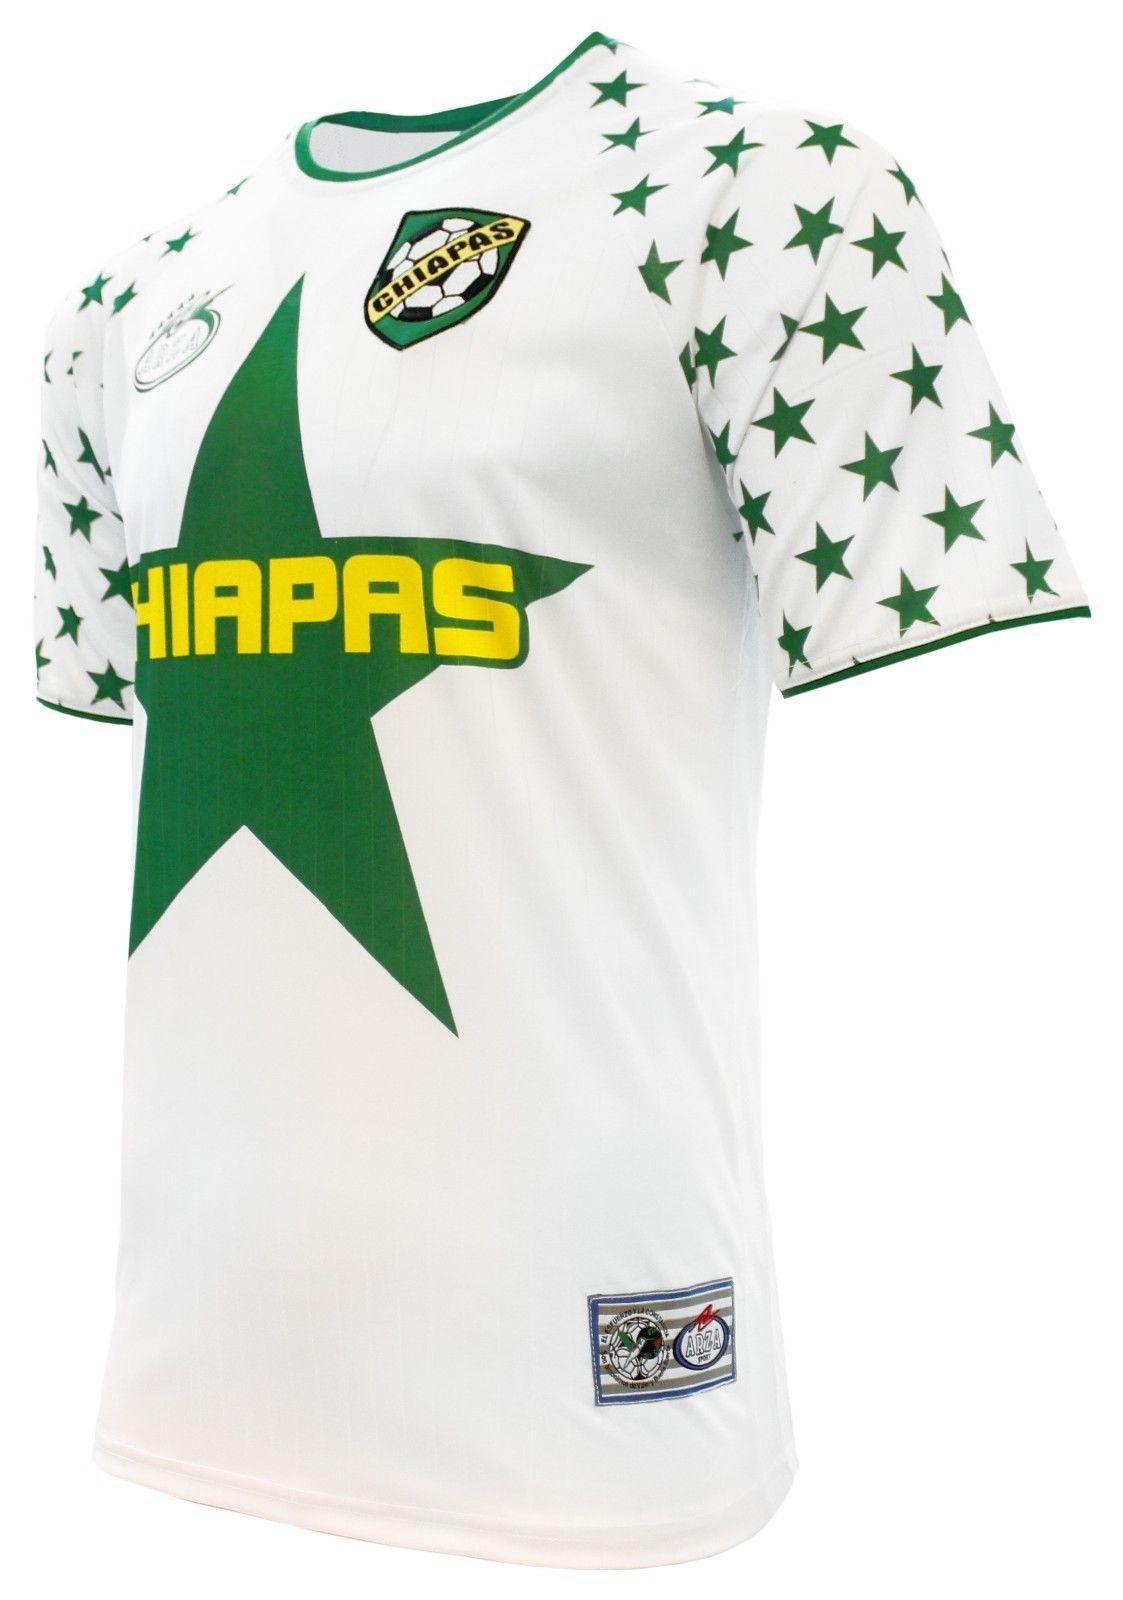 Arza Sports Men Mexico Fan Jersey 2018 Color Green